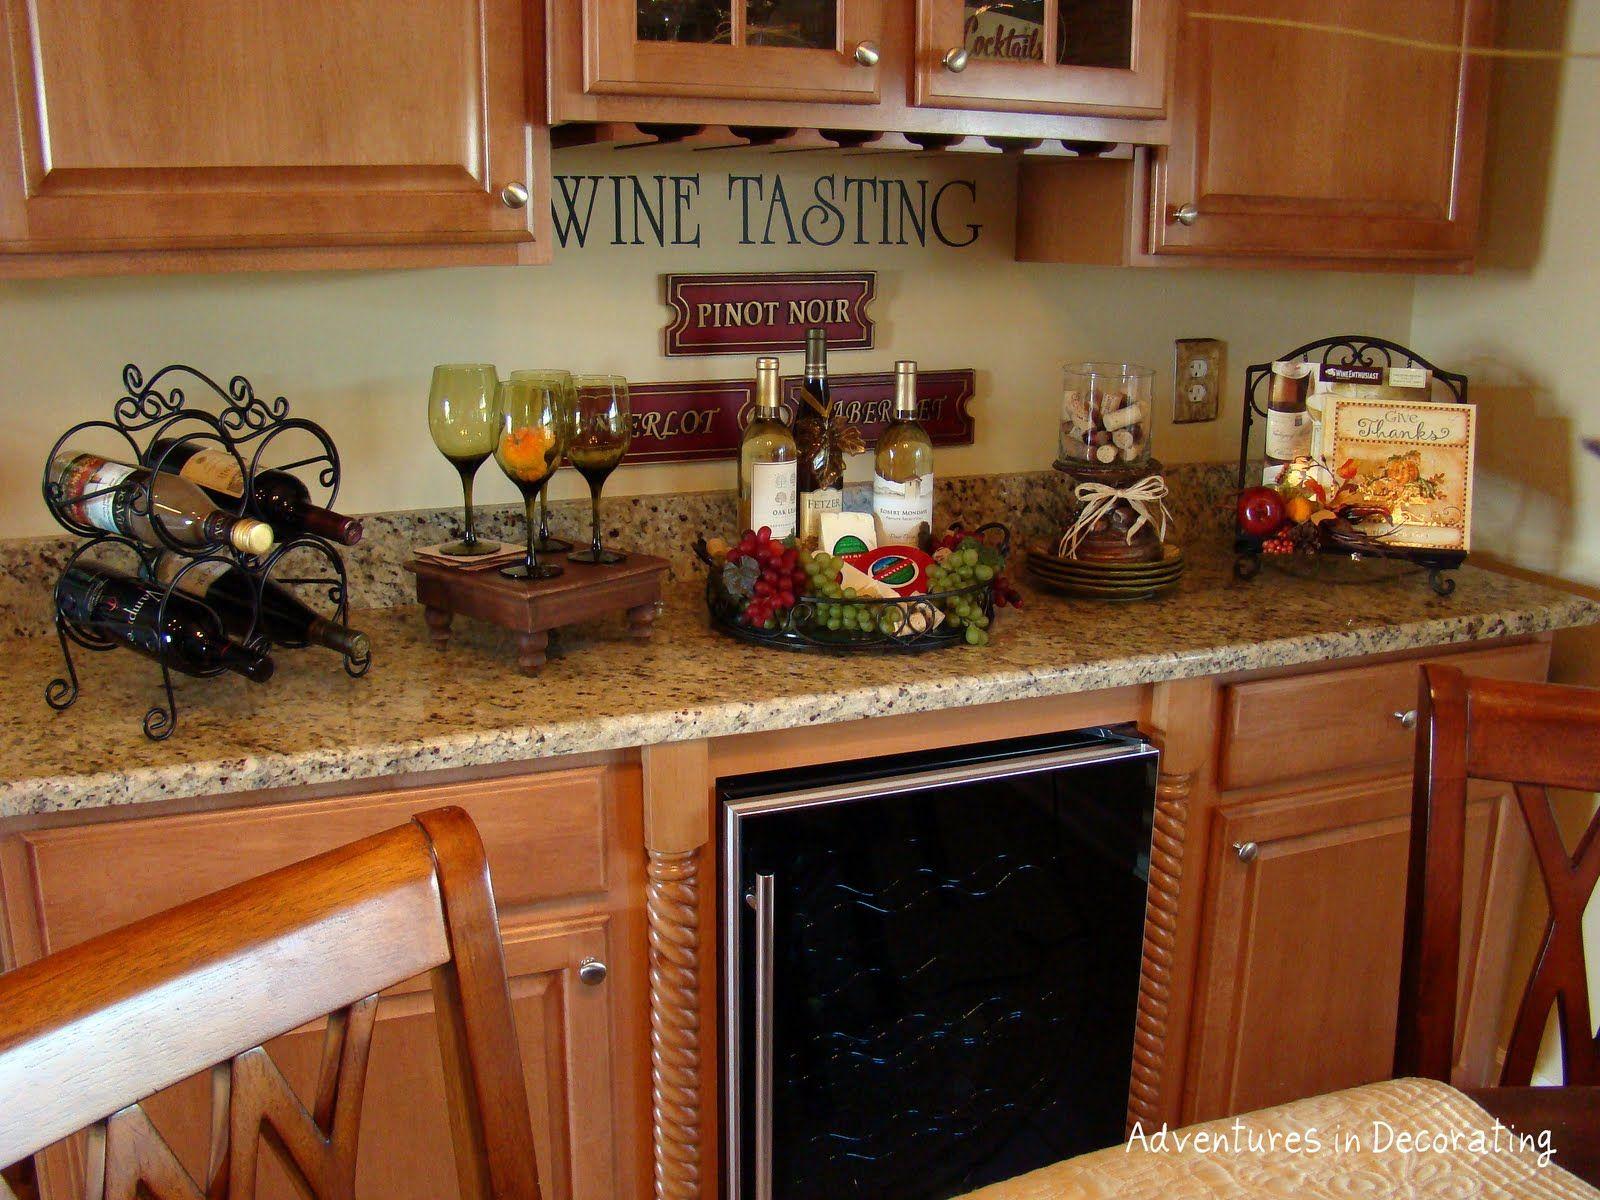 Winebar Jpg 1600 1200 Grape Kitchen Decor Wine Decor Kitchen Wine Theme Kitchen